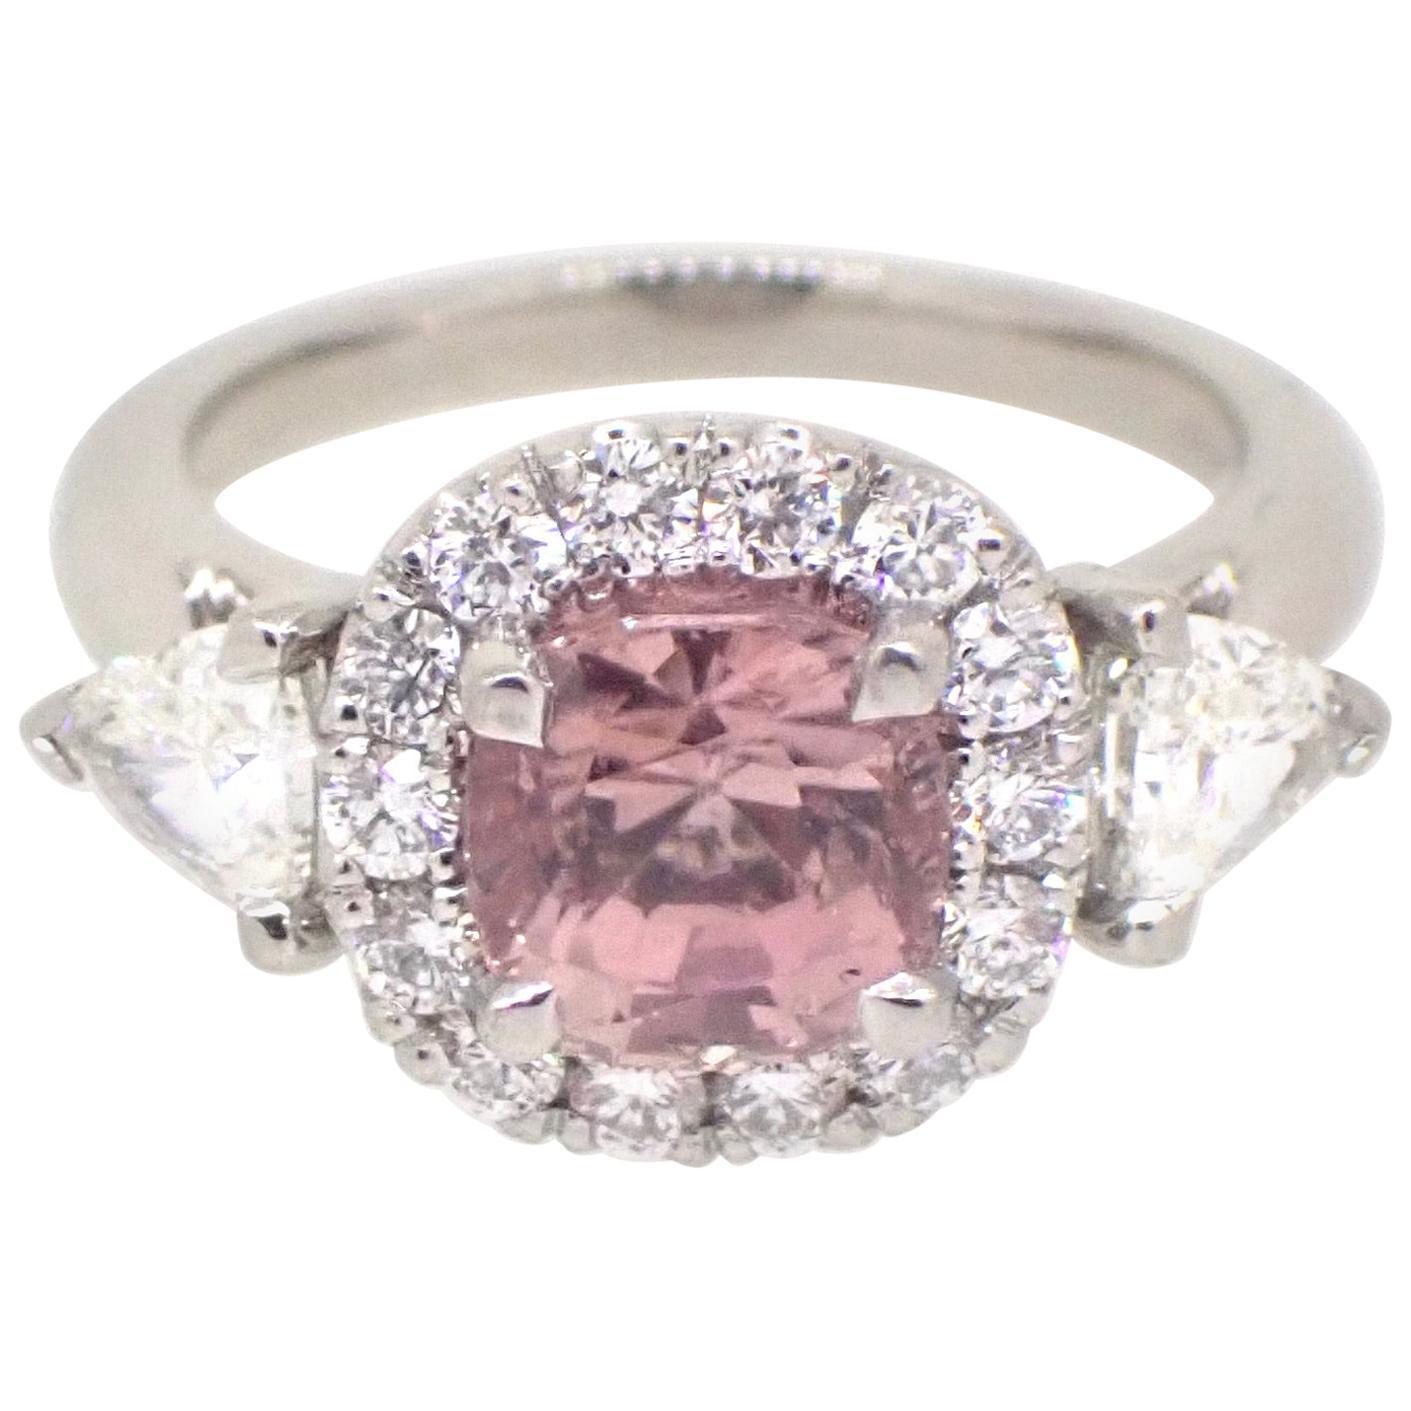 1.95 Carat Pink Tourmaline Diamond Platinum Engagement Ring